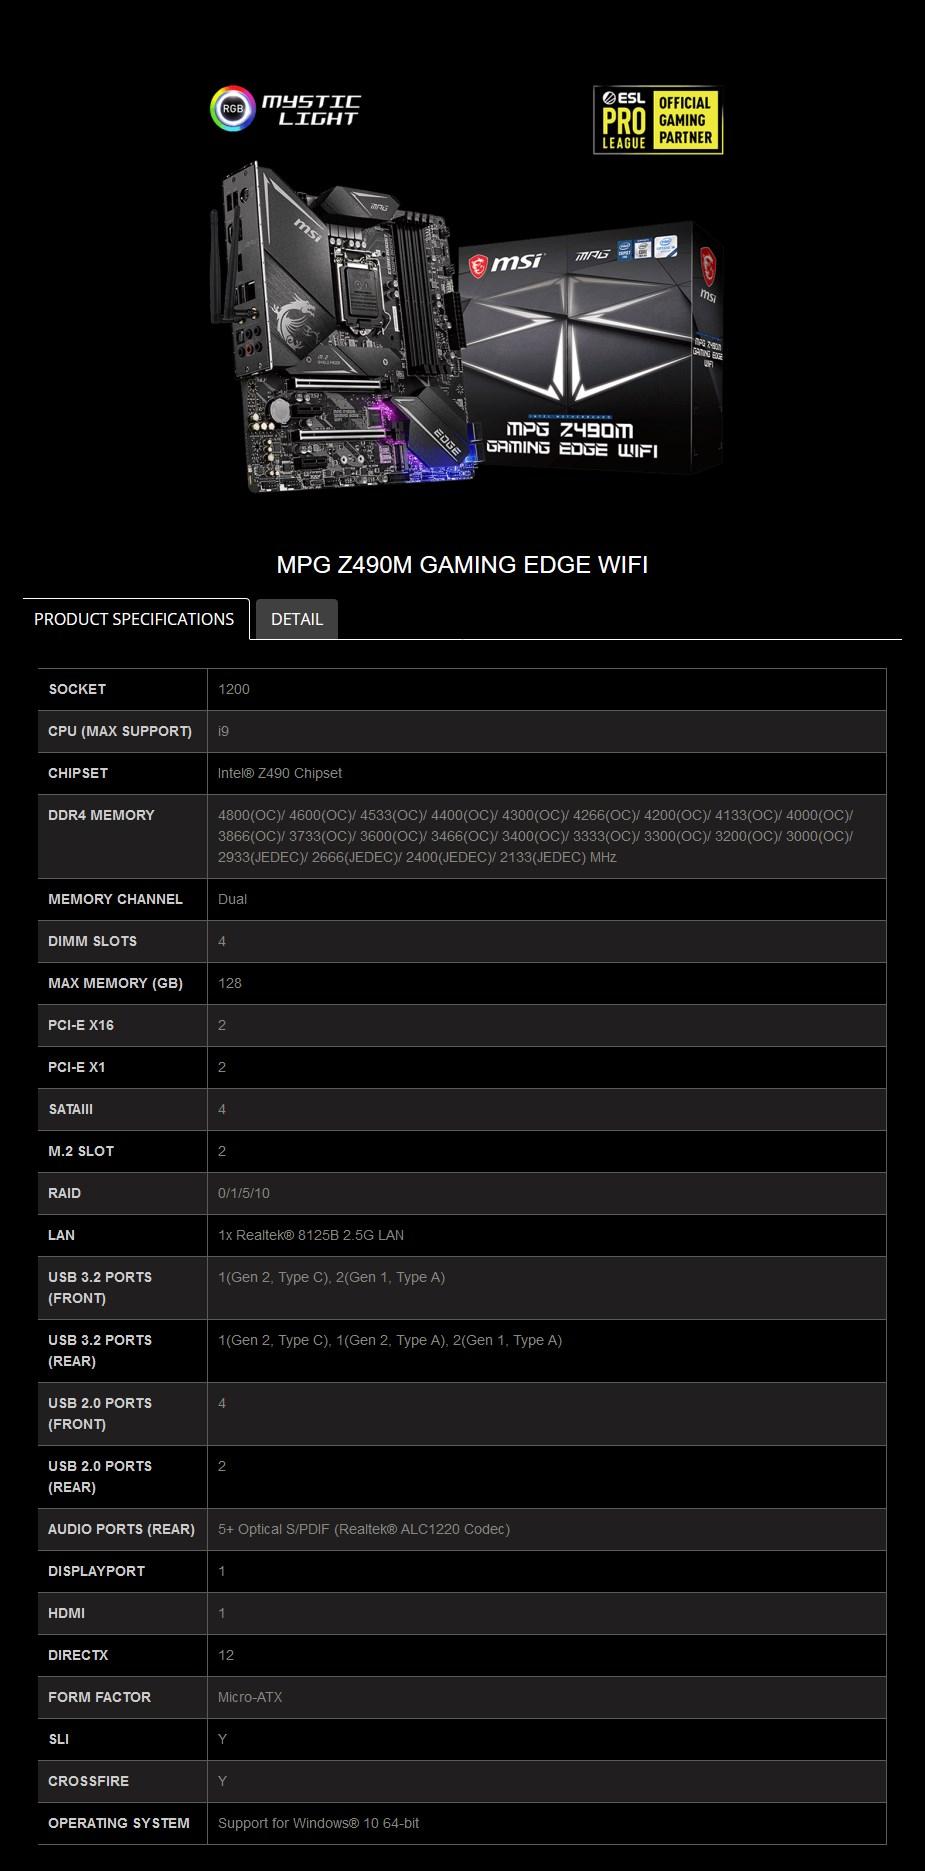 MSI MPG Z490M GAMING EDGE WIFI LGA 1200 Micro-ATX Motherboard - Overview 2